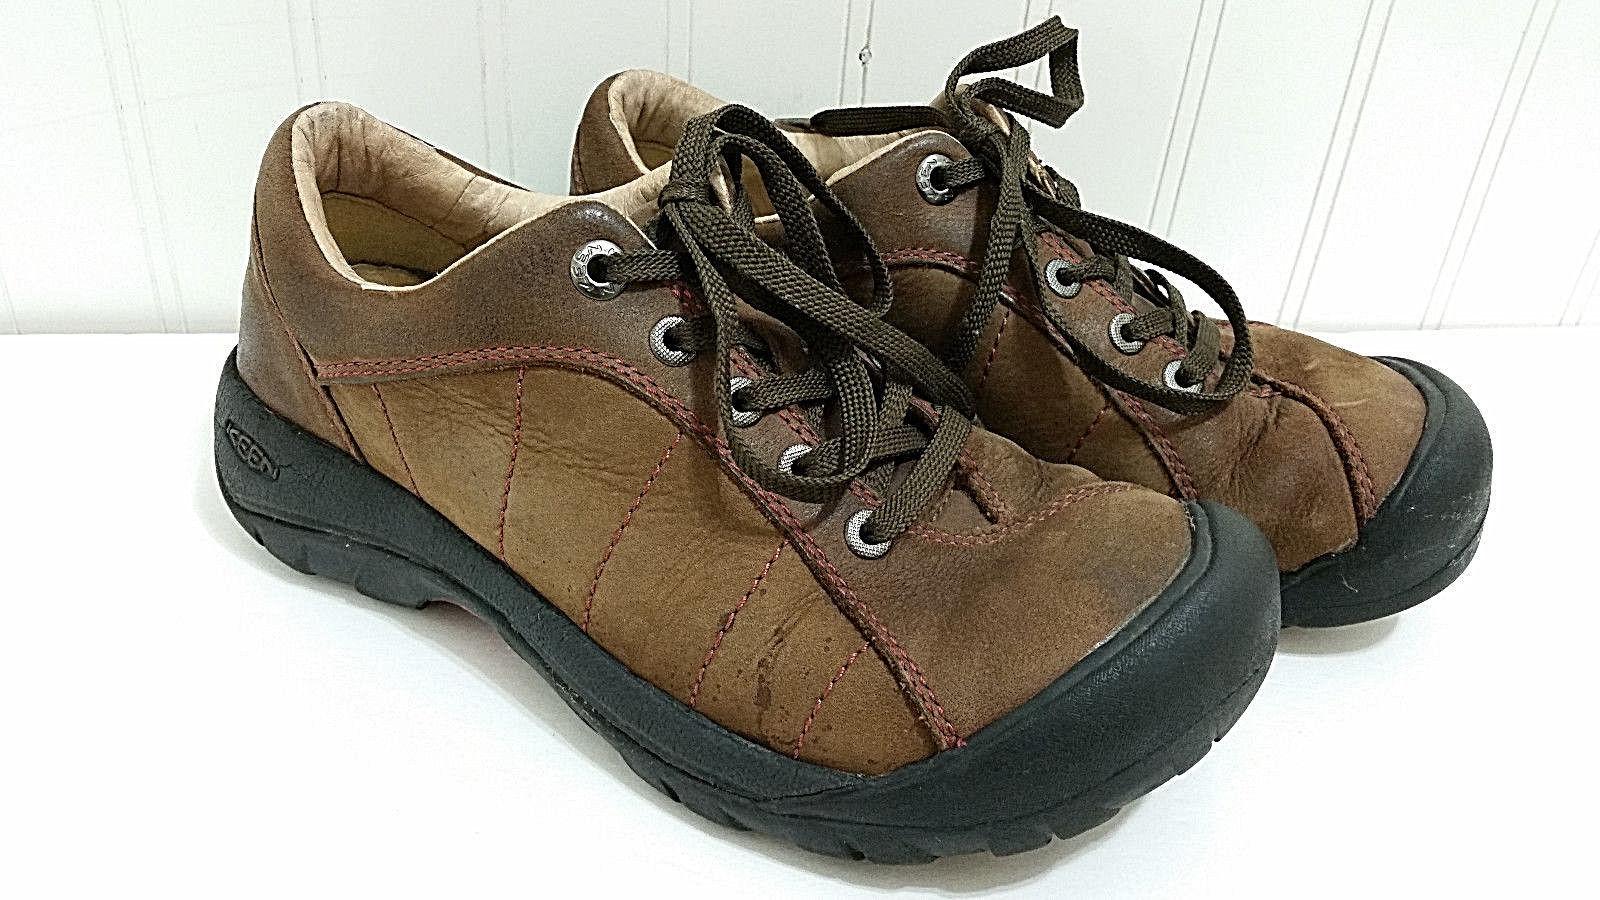 KEEN Pelle scarpe Presidio Pelle KEEN Lace Up Walnut and 50 similar items 3e867b